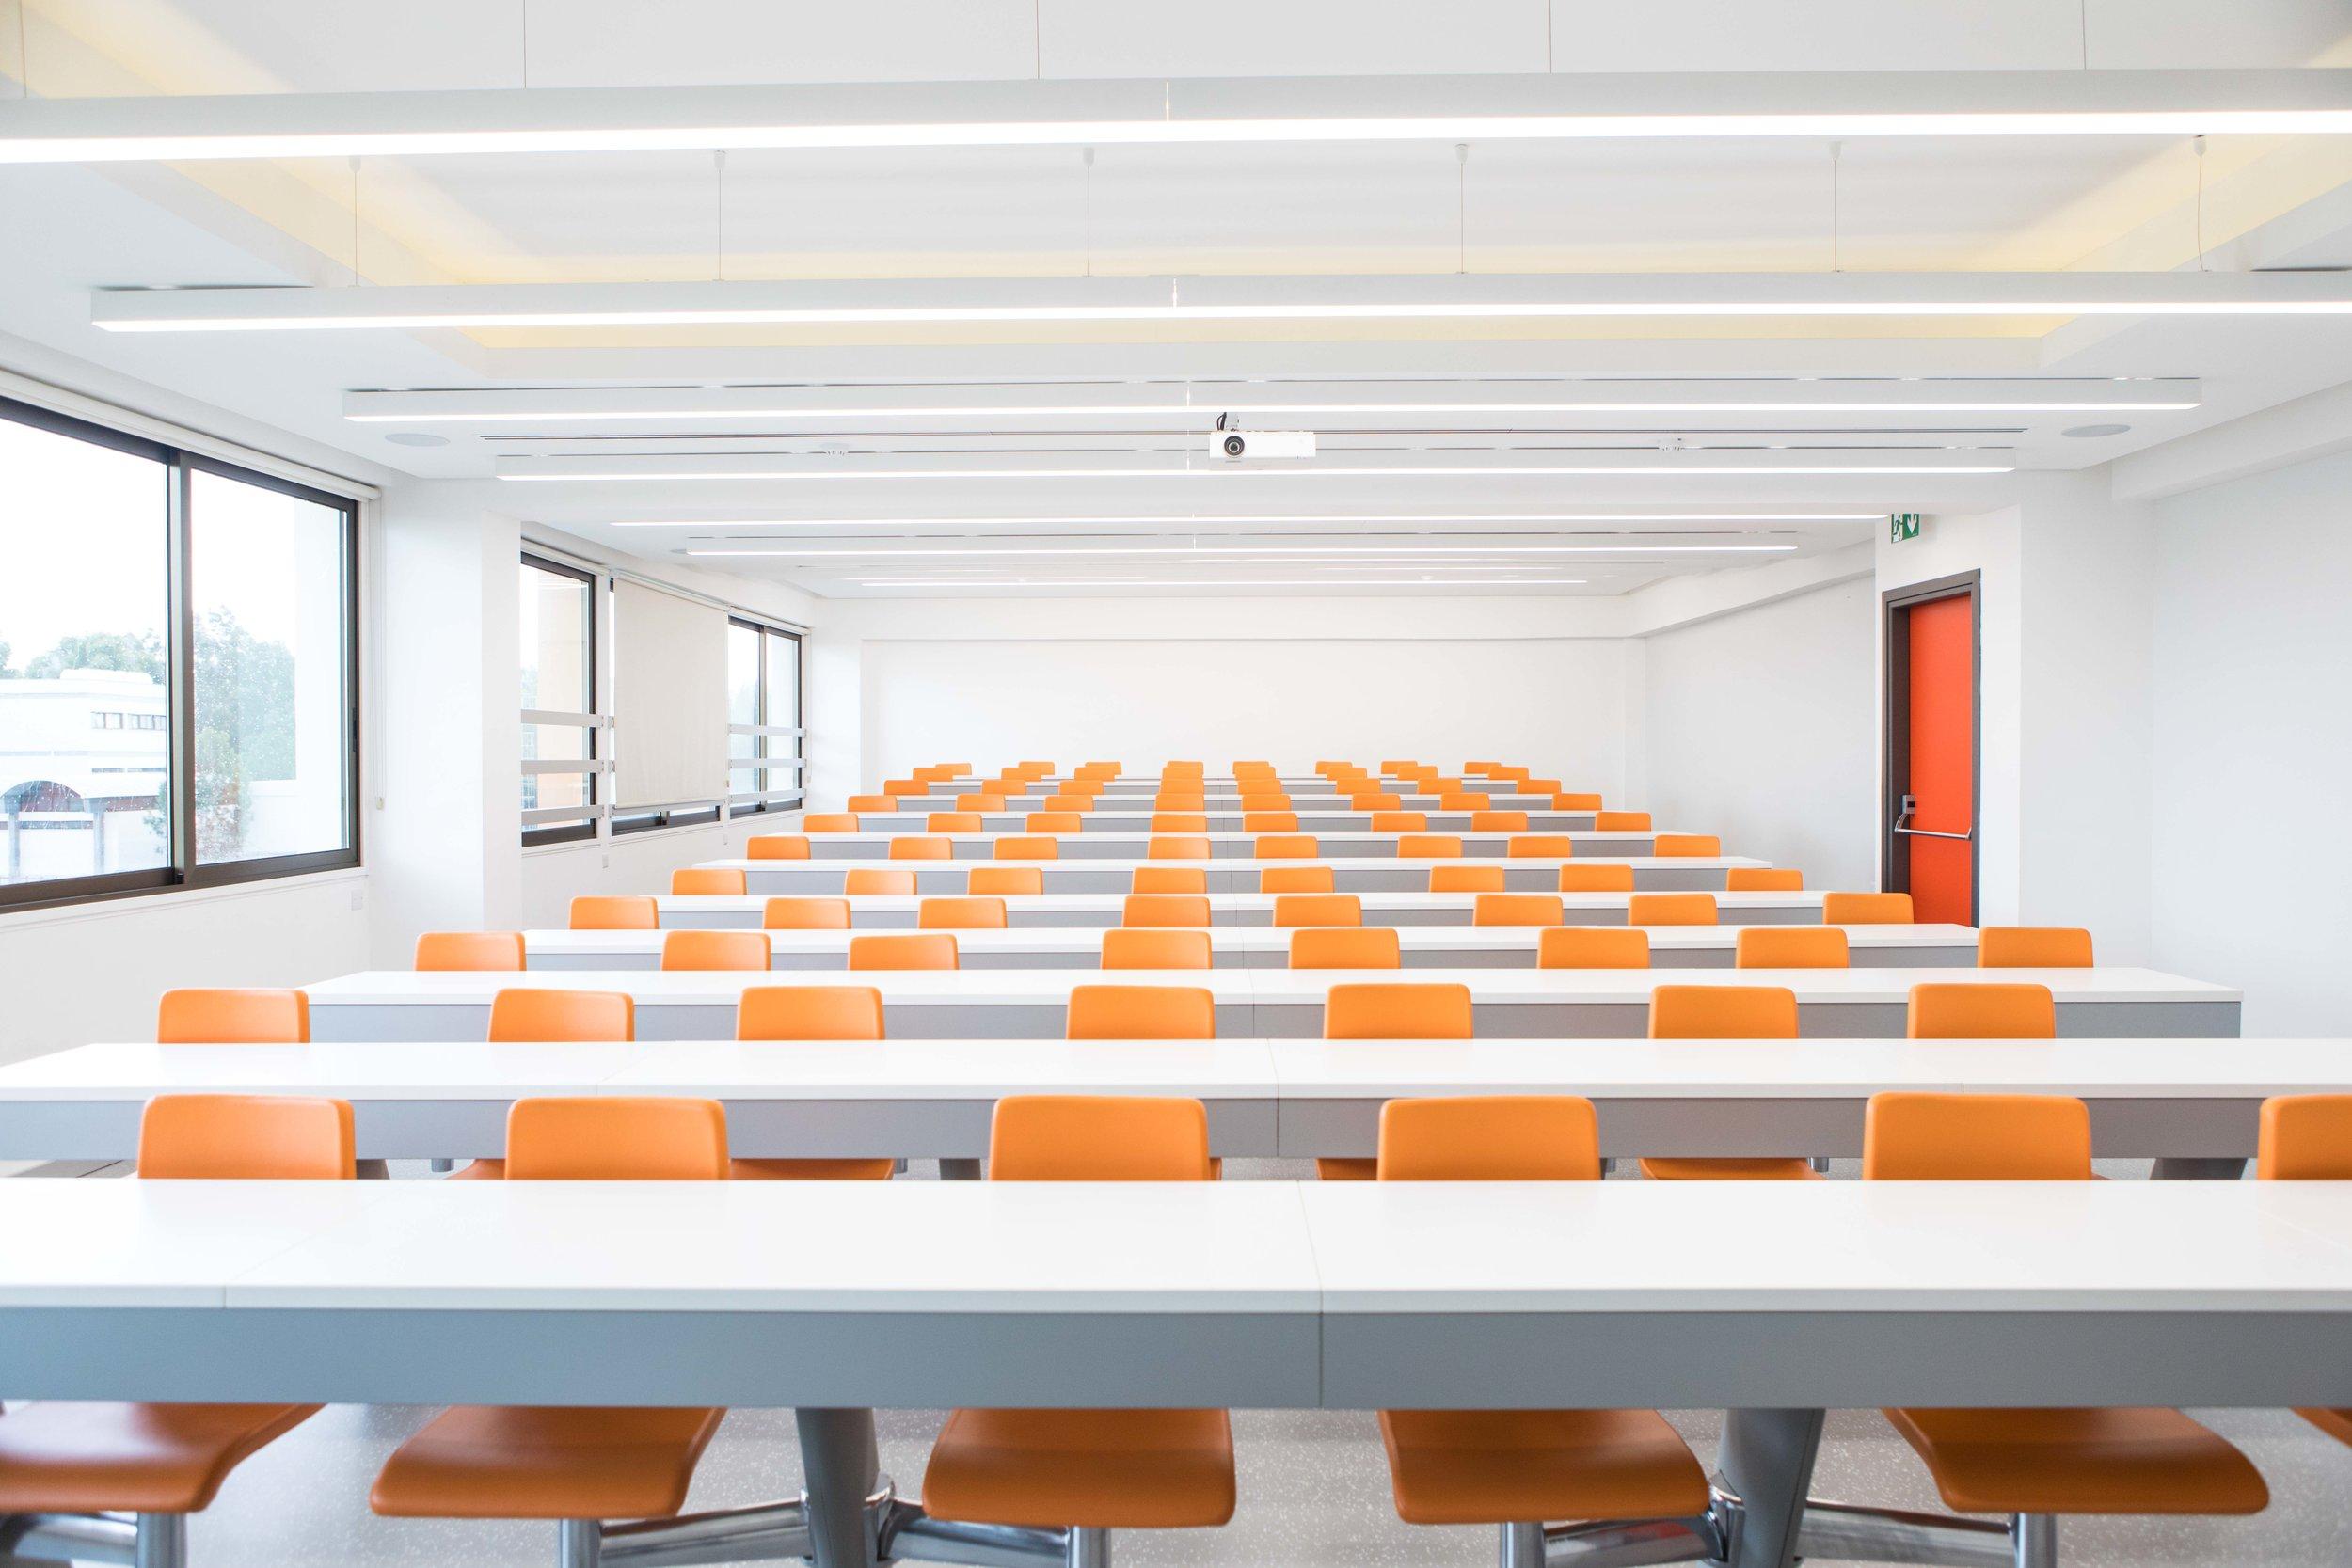 EuropeanUniversity©AndreasPoupoutsis-27-min.jpg